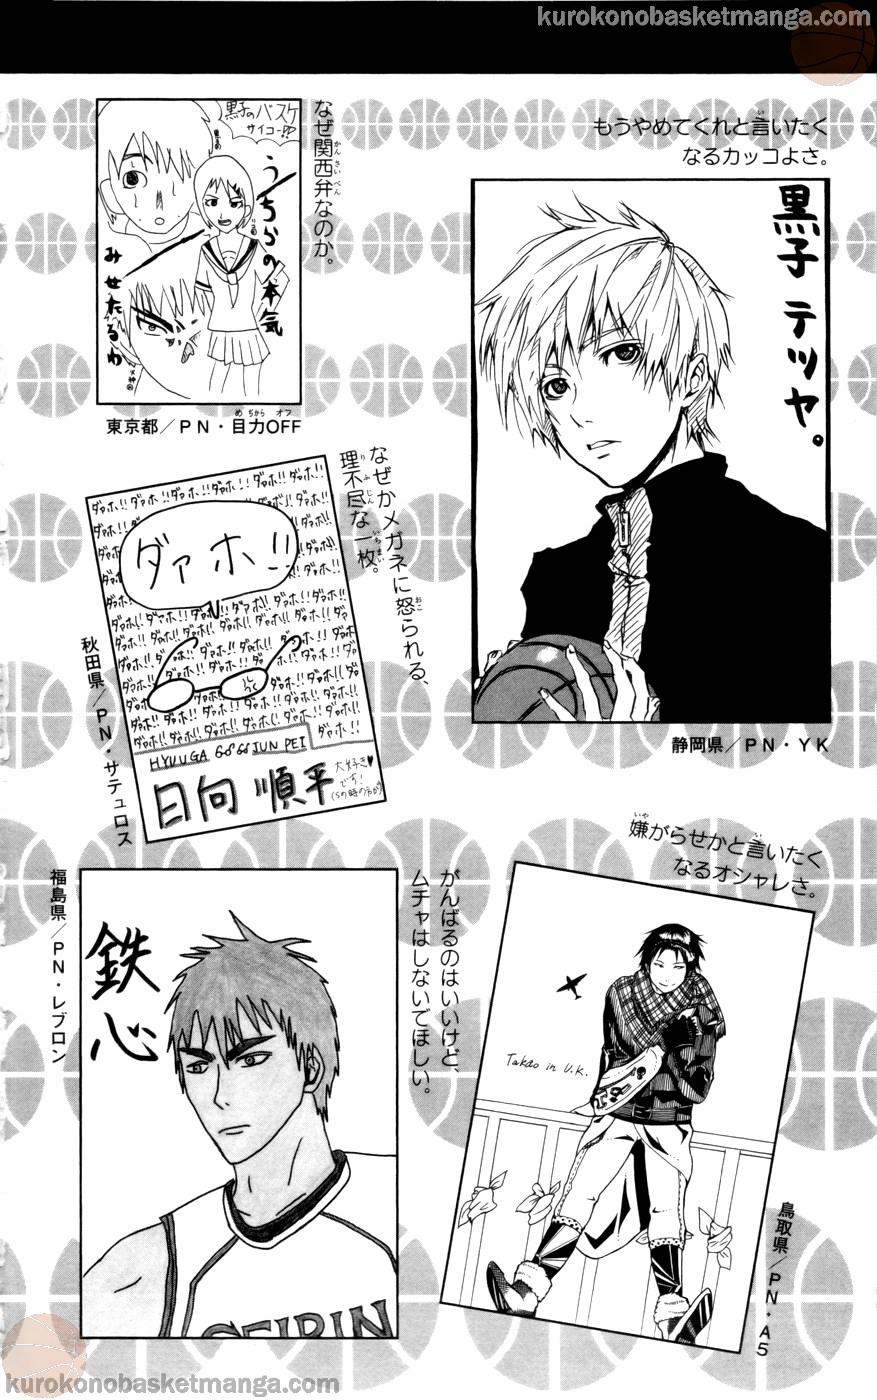 Kuroko no Basket Manga Chapter 108 - Image 27